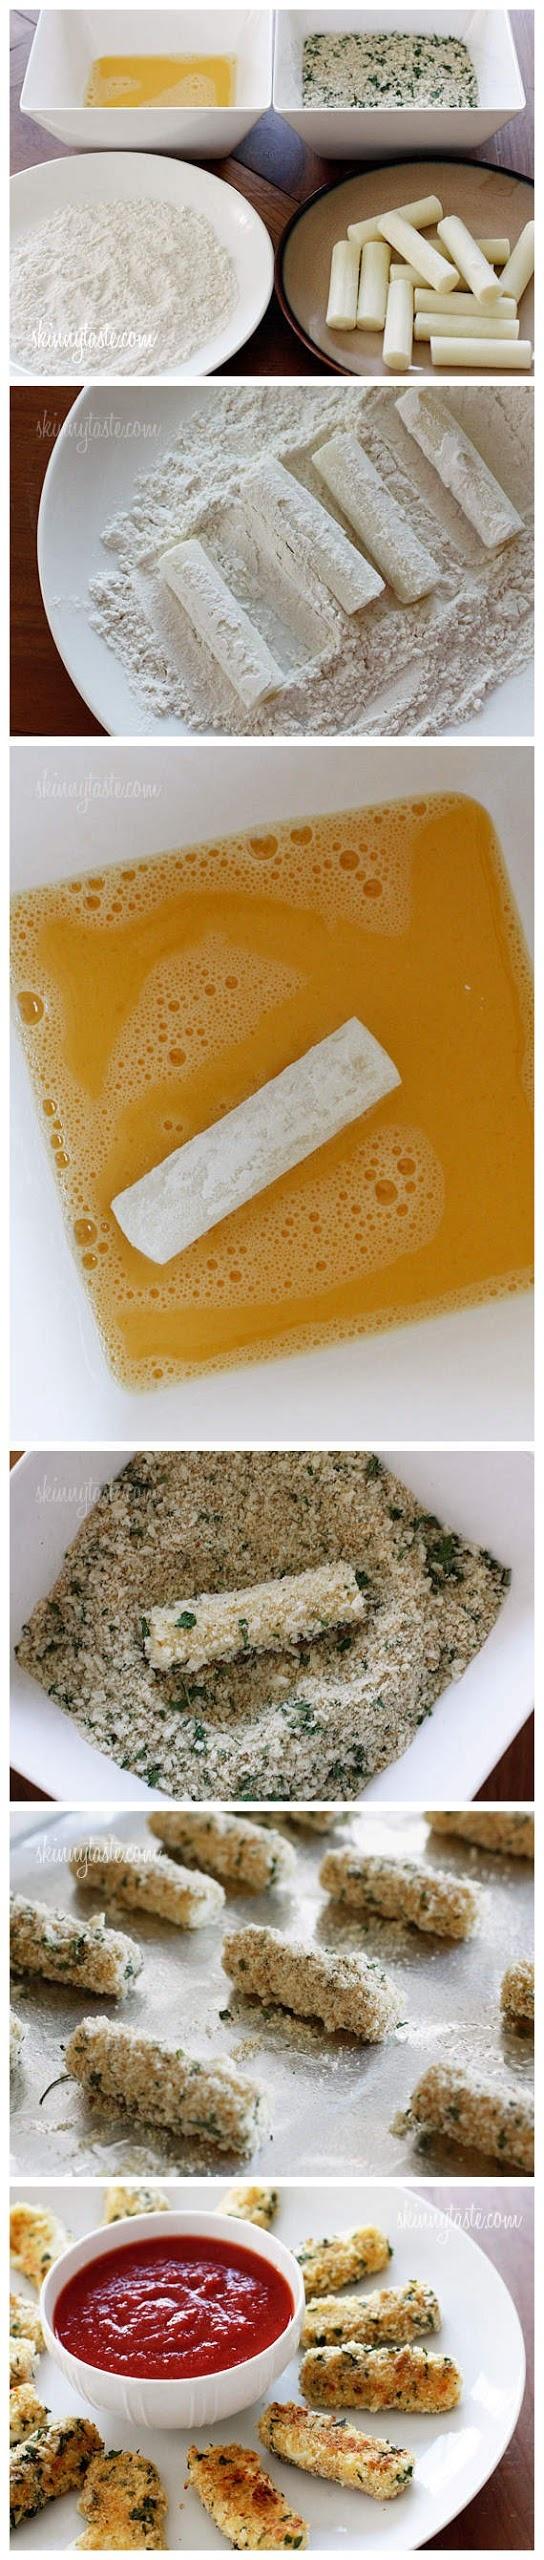 Skinny Baked Mozzarella Sticks | Back To Basics | Pinterest